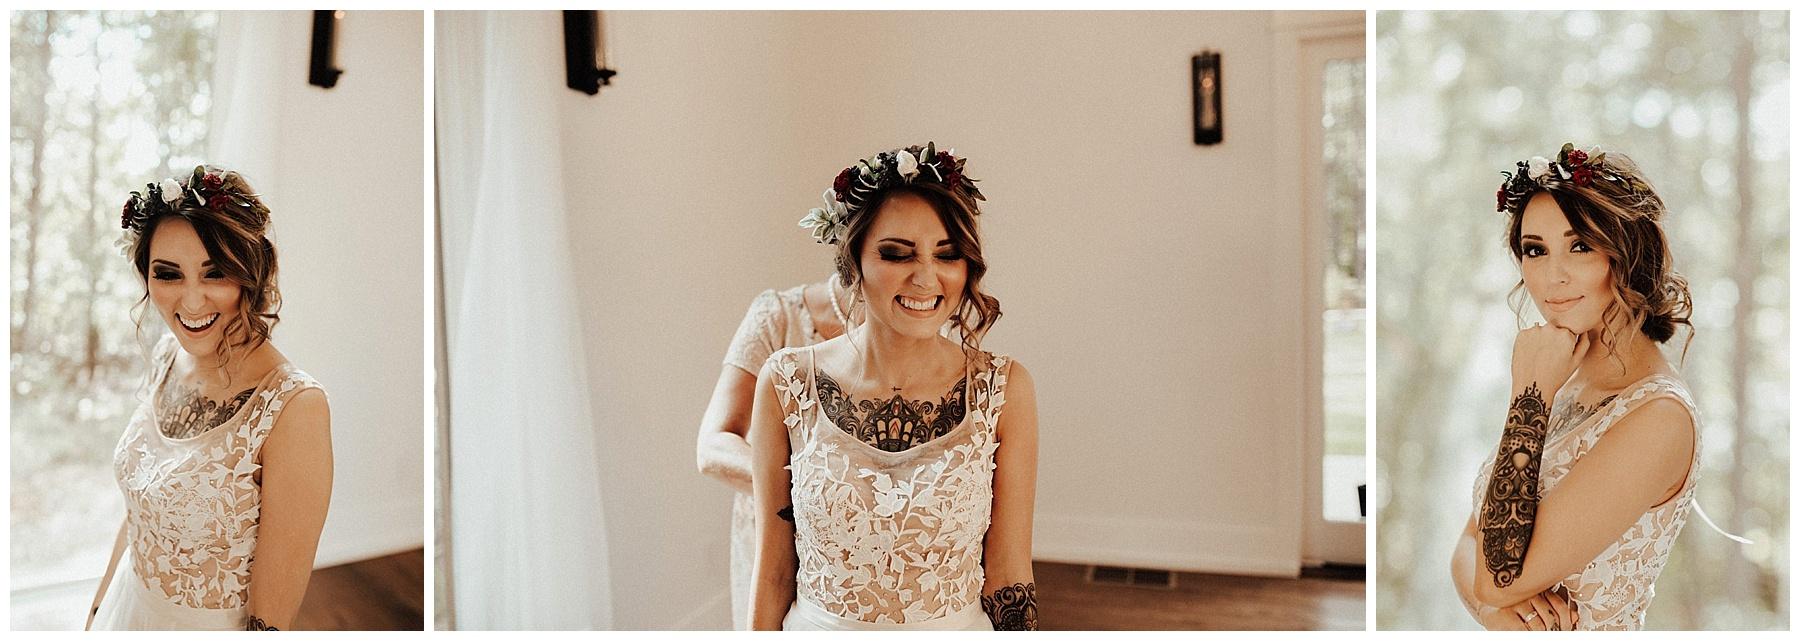 Georgia Wedding Tampa Wedding Photographer-59.jpg